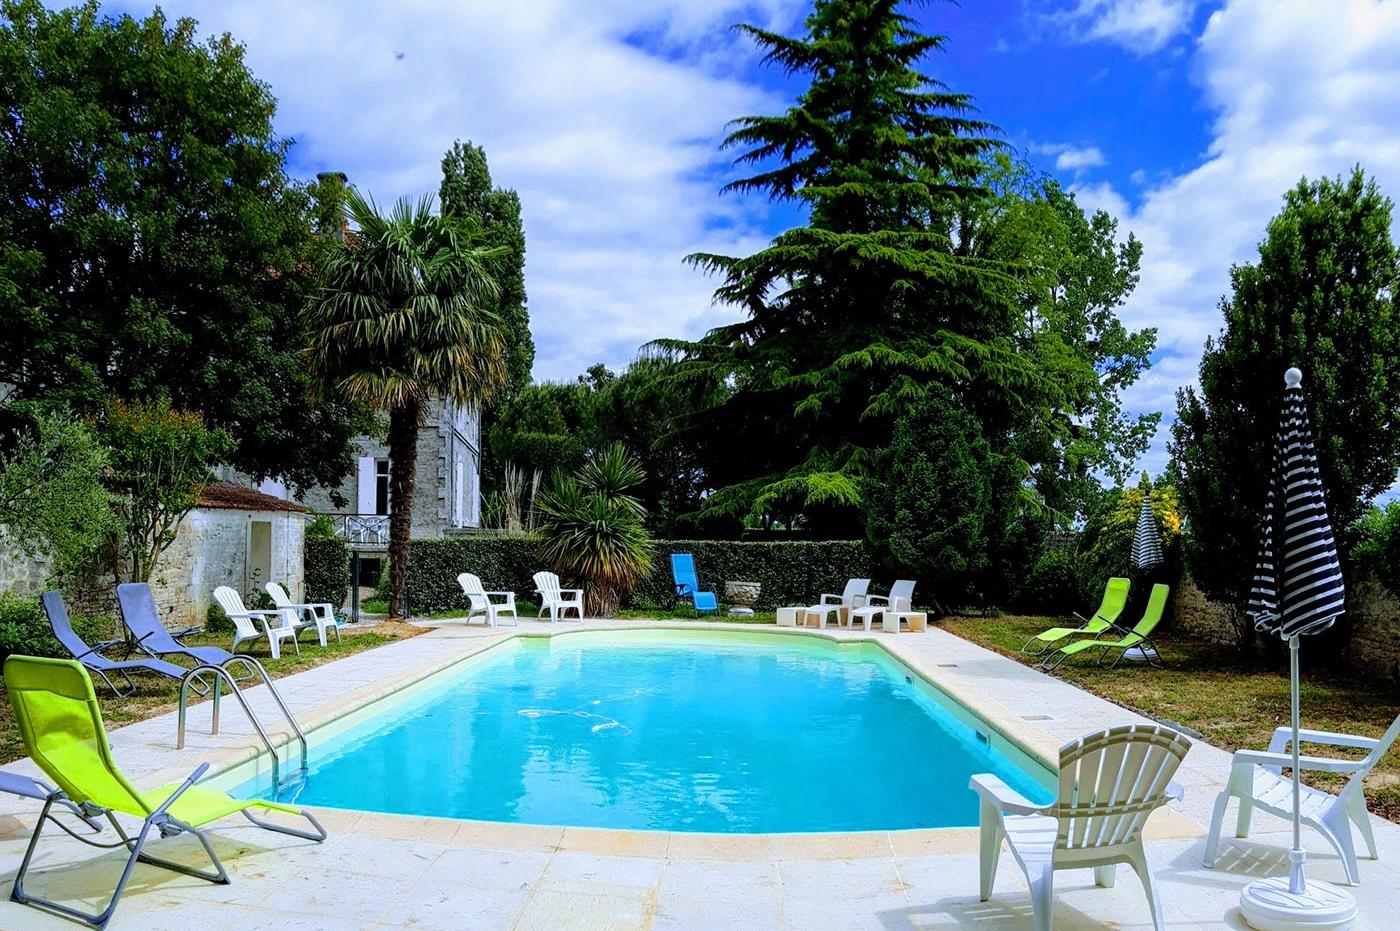 Swimming pool at the Domain Tesseron